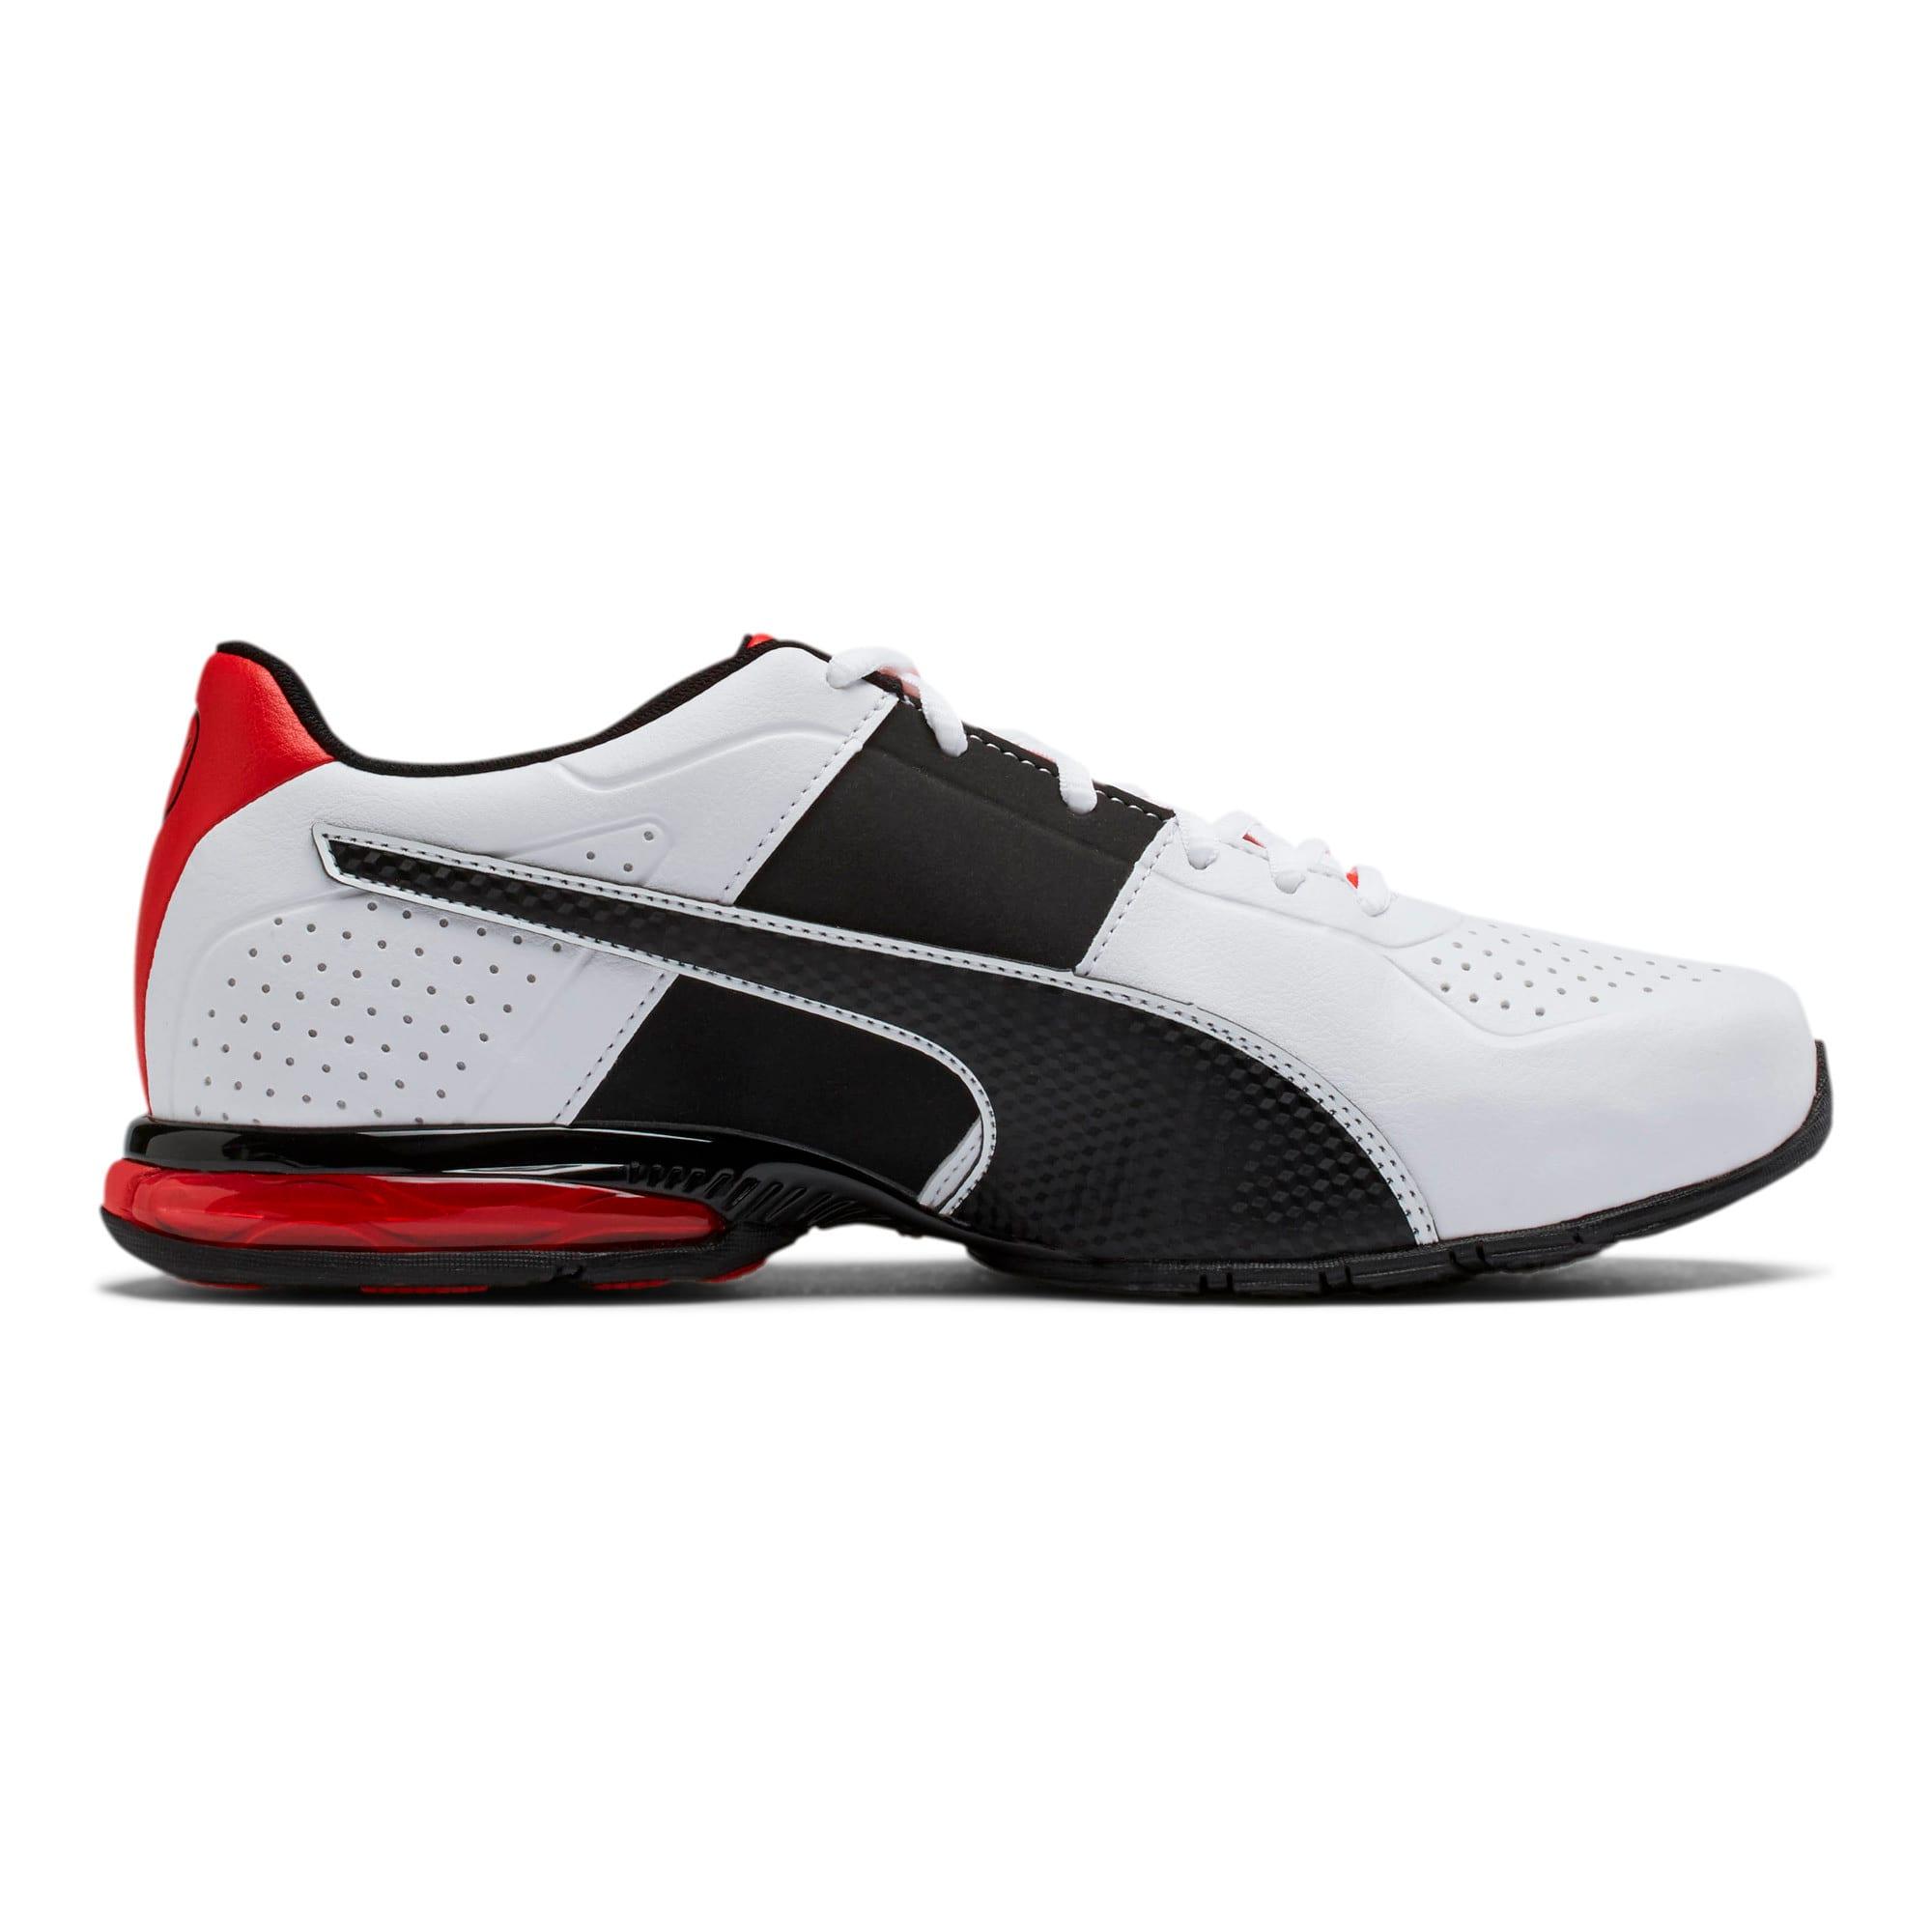 Thumbnail 5 of CELL Surin 2 FM Men's Running Shoes, White-Black-flame scarlet, medium